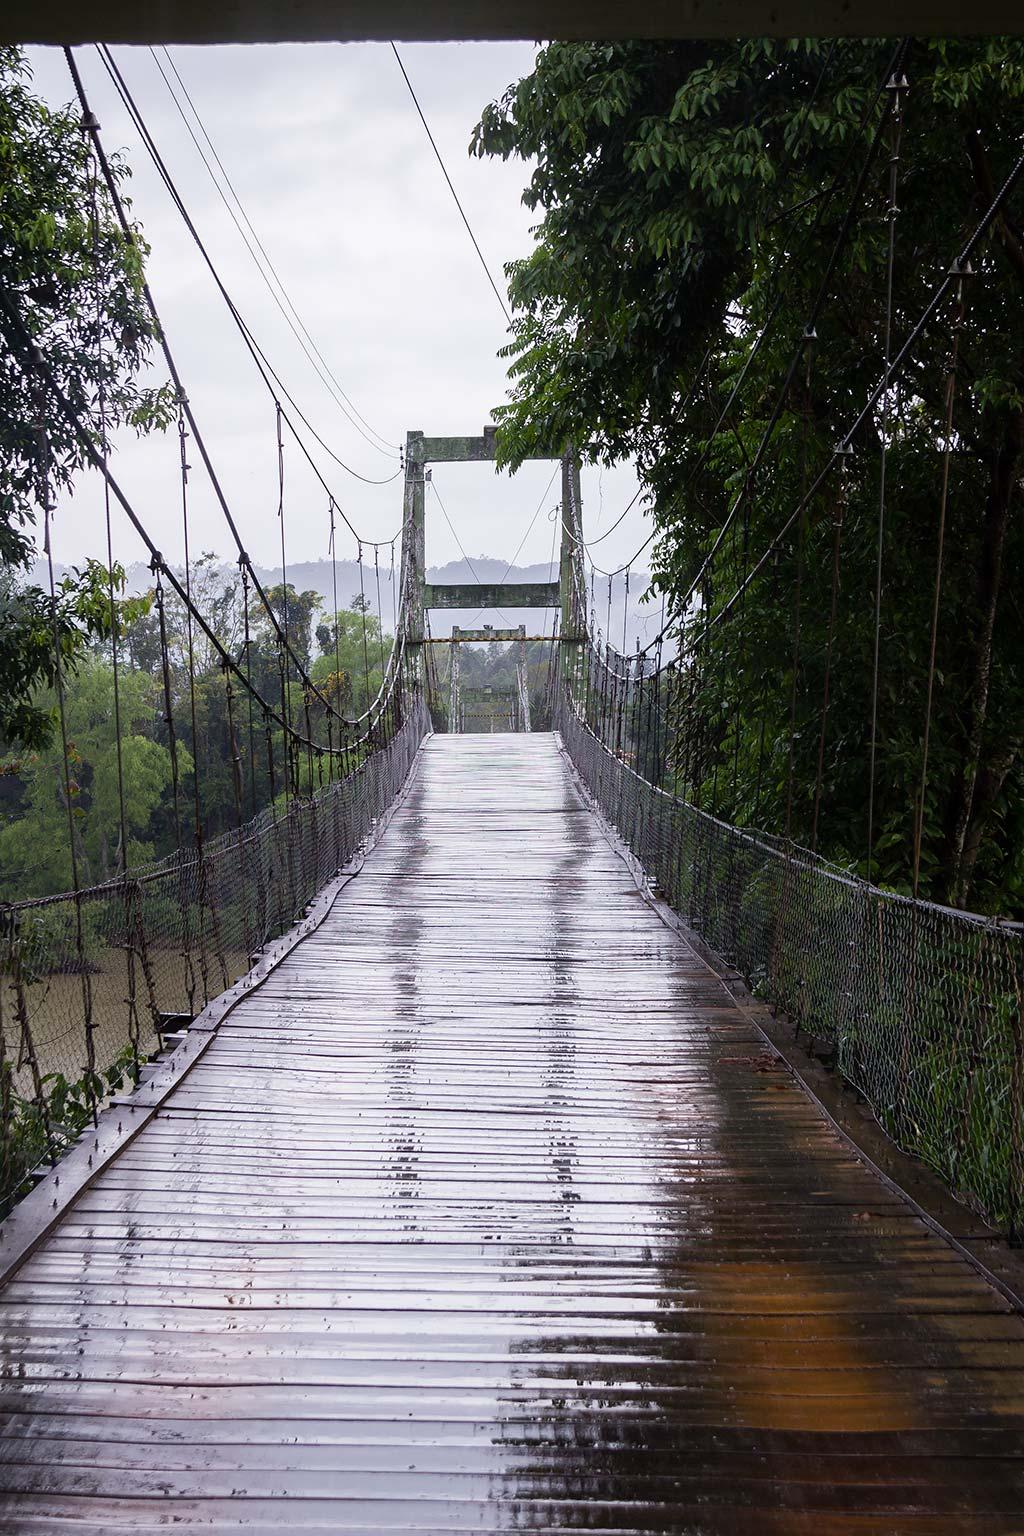 Circuito Vale Europeu - Dia 5 - Ascurra - Ponte Pênsil Rio Itajaí-Açu